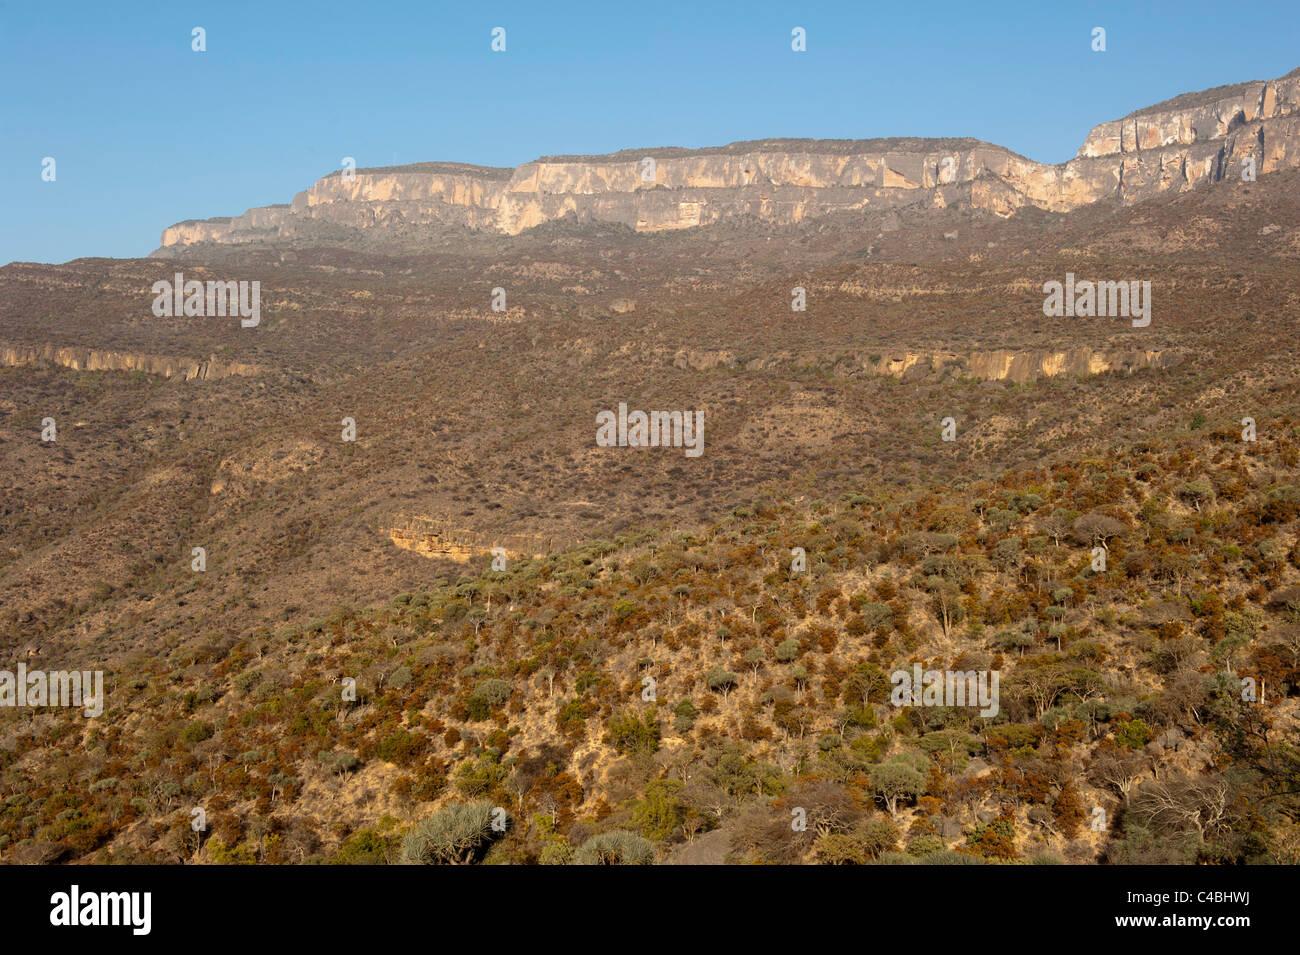 Daallo escarpment, Somaliland, Somalia - Stock Image